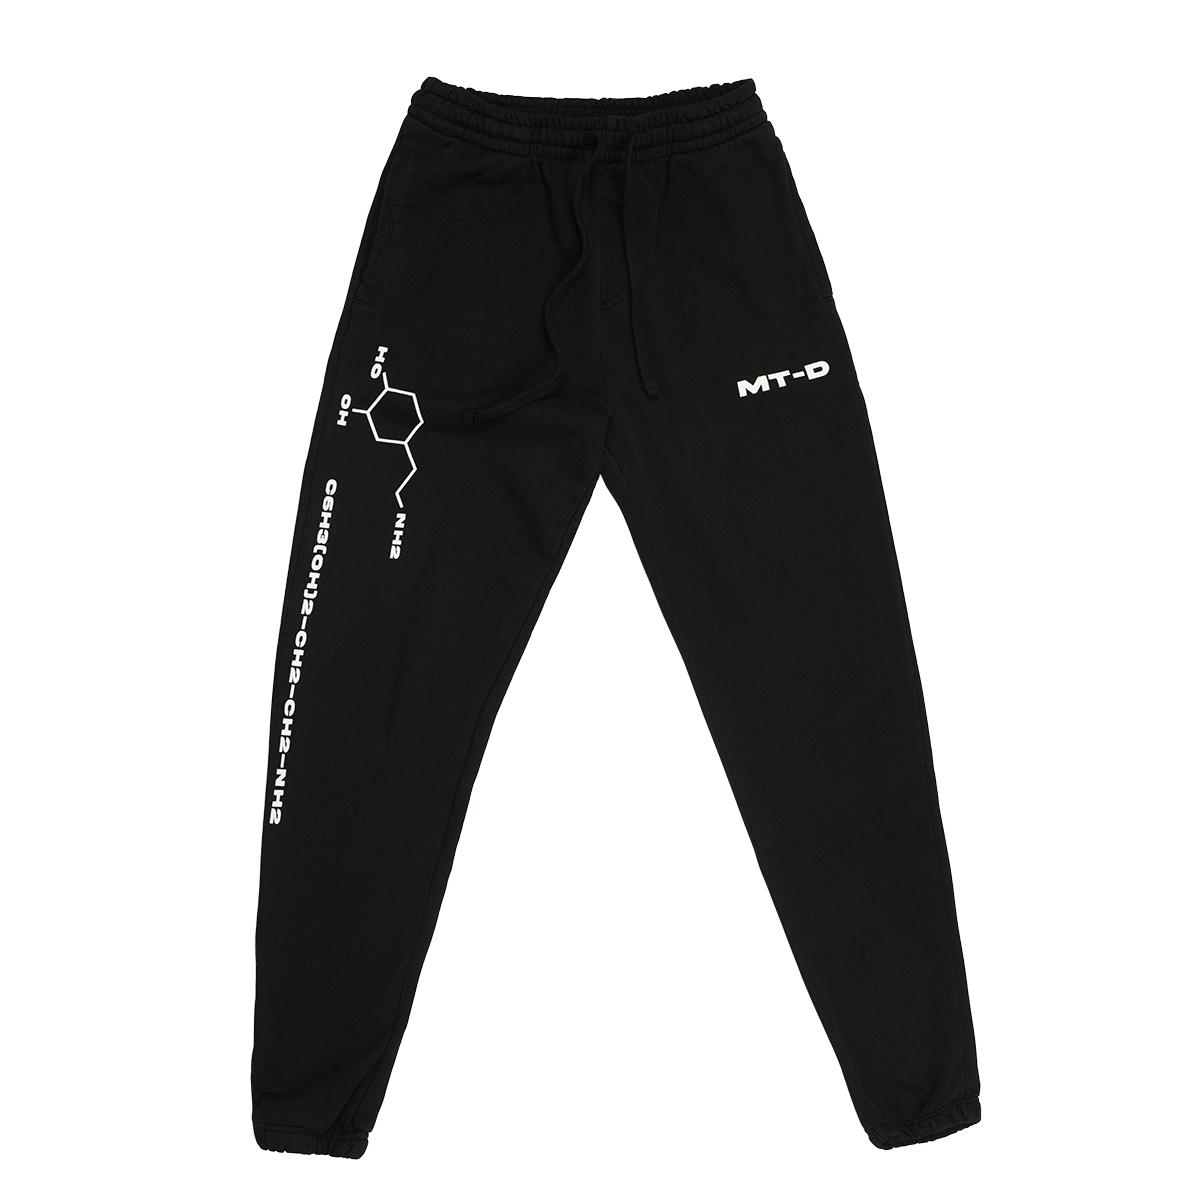 Dopamina Black Sweatpants